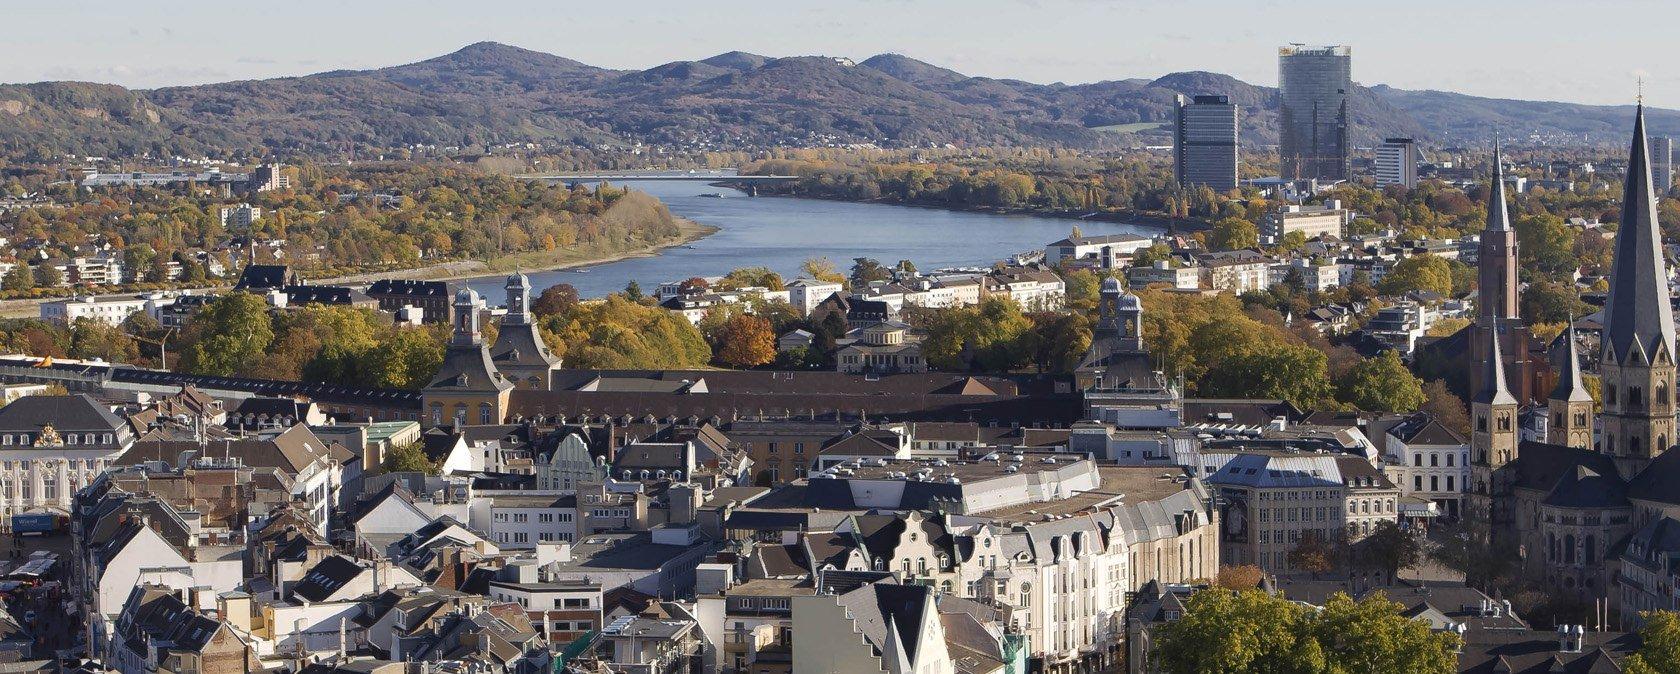 Foto aérea de Bonn Foto: Enap